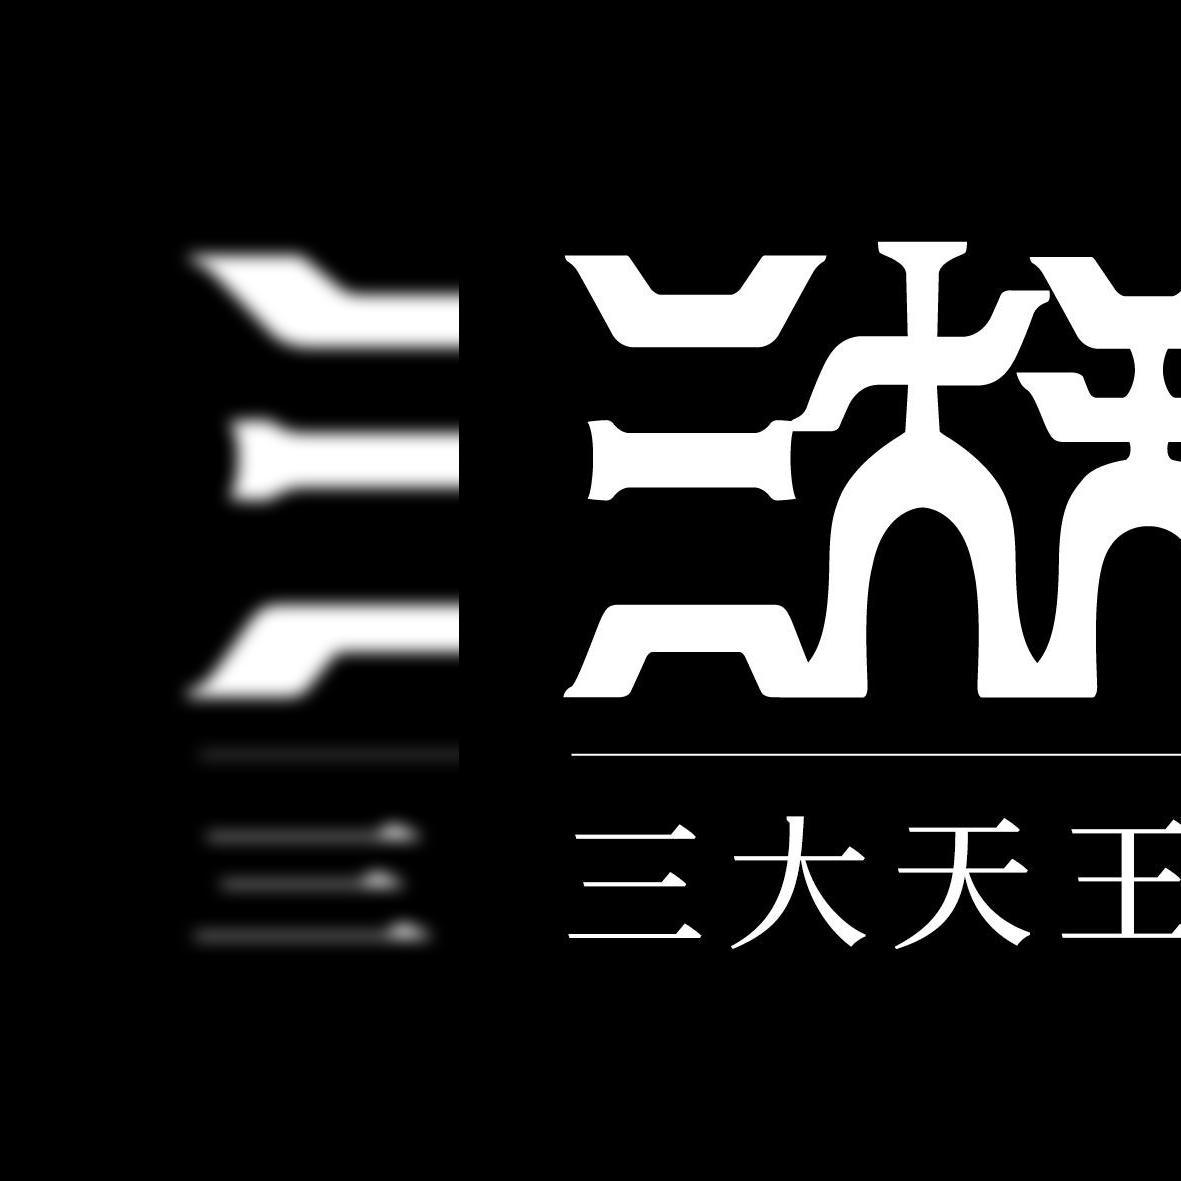 三大天王影业